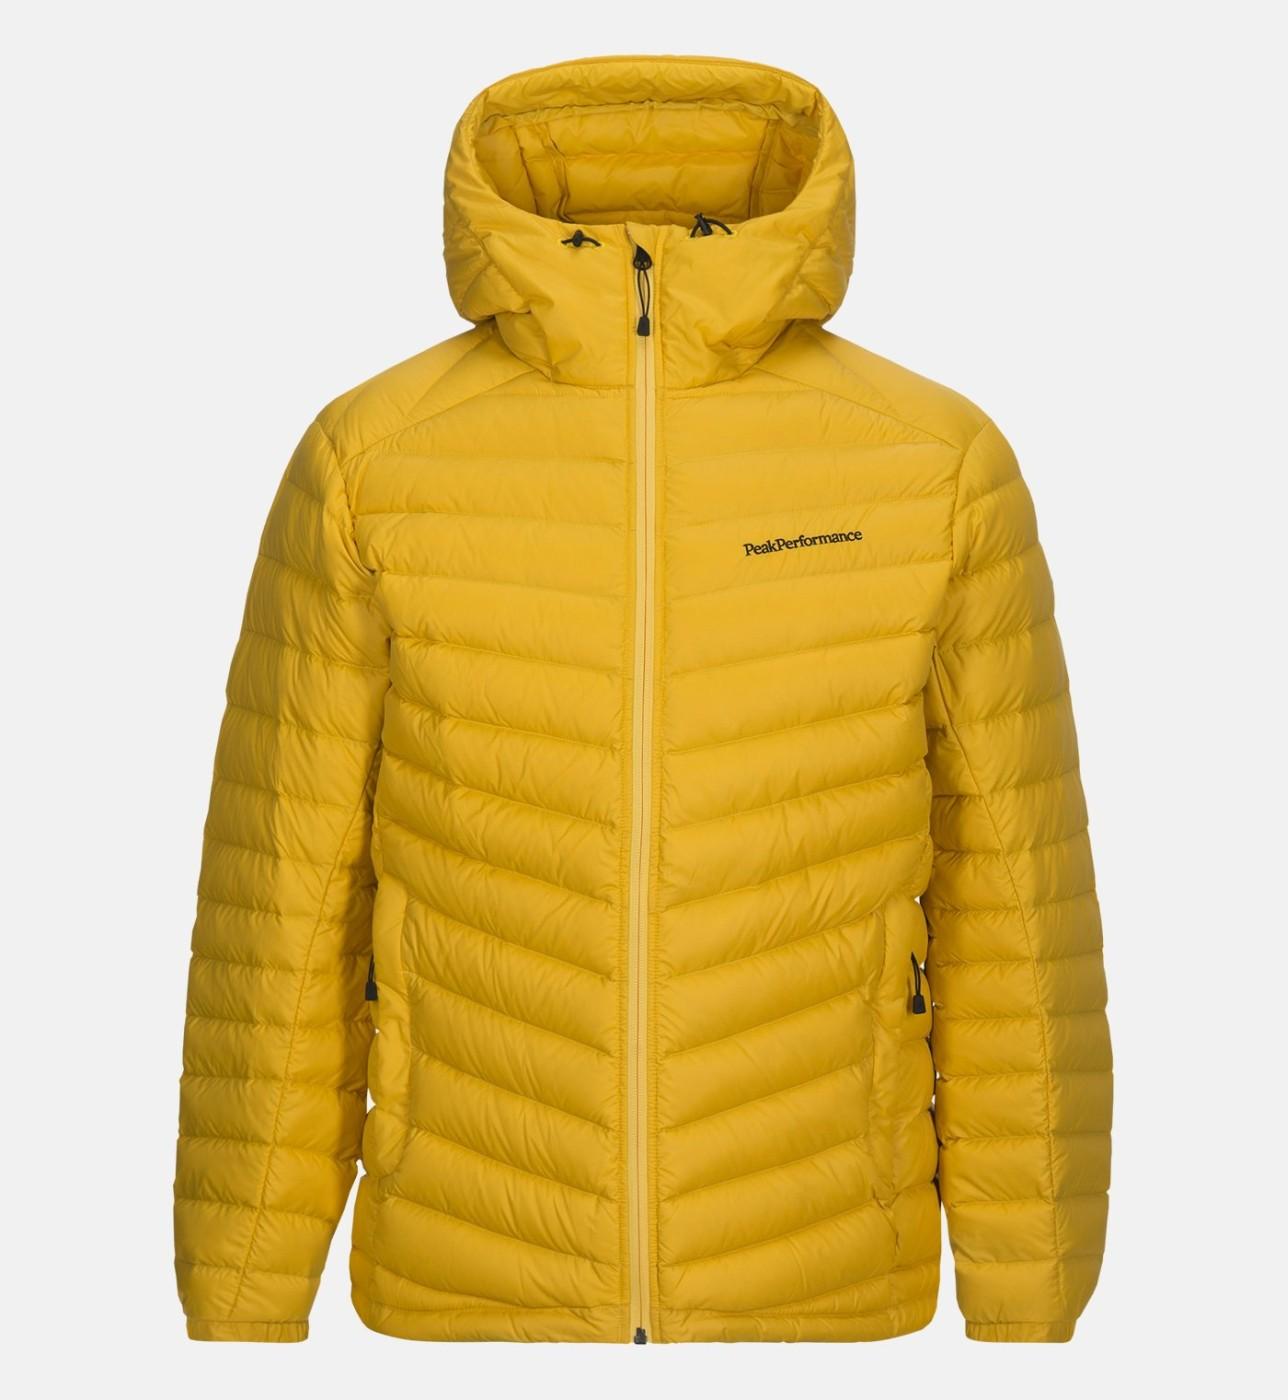 26a07f9b1 Peak Performance Men's Pertex Frost Down Hooded Jacket Desert Yellow ...